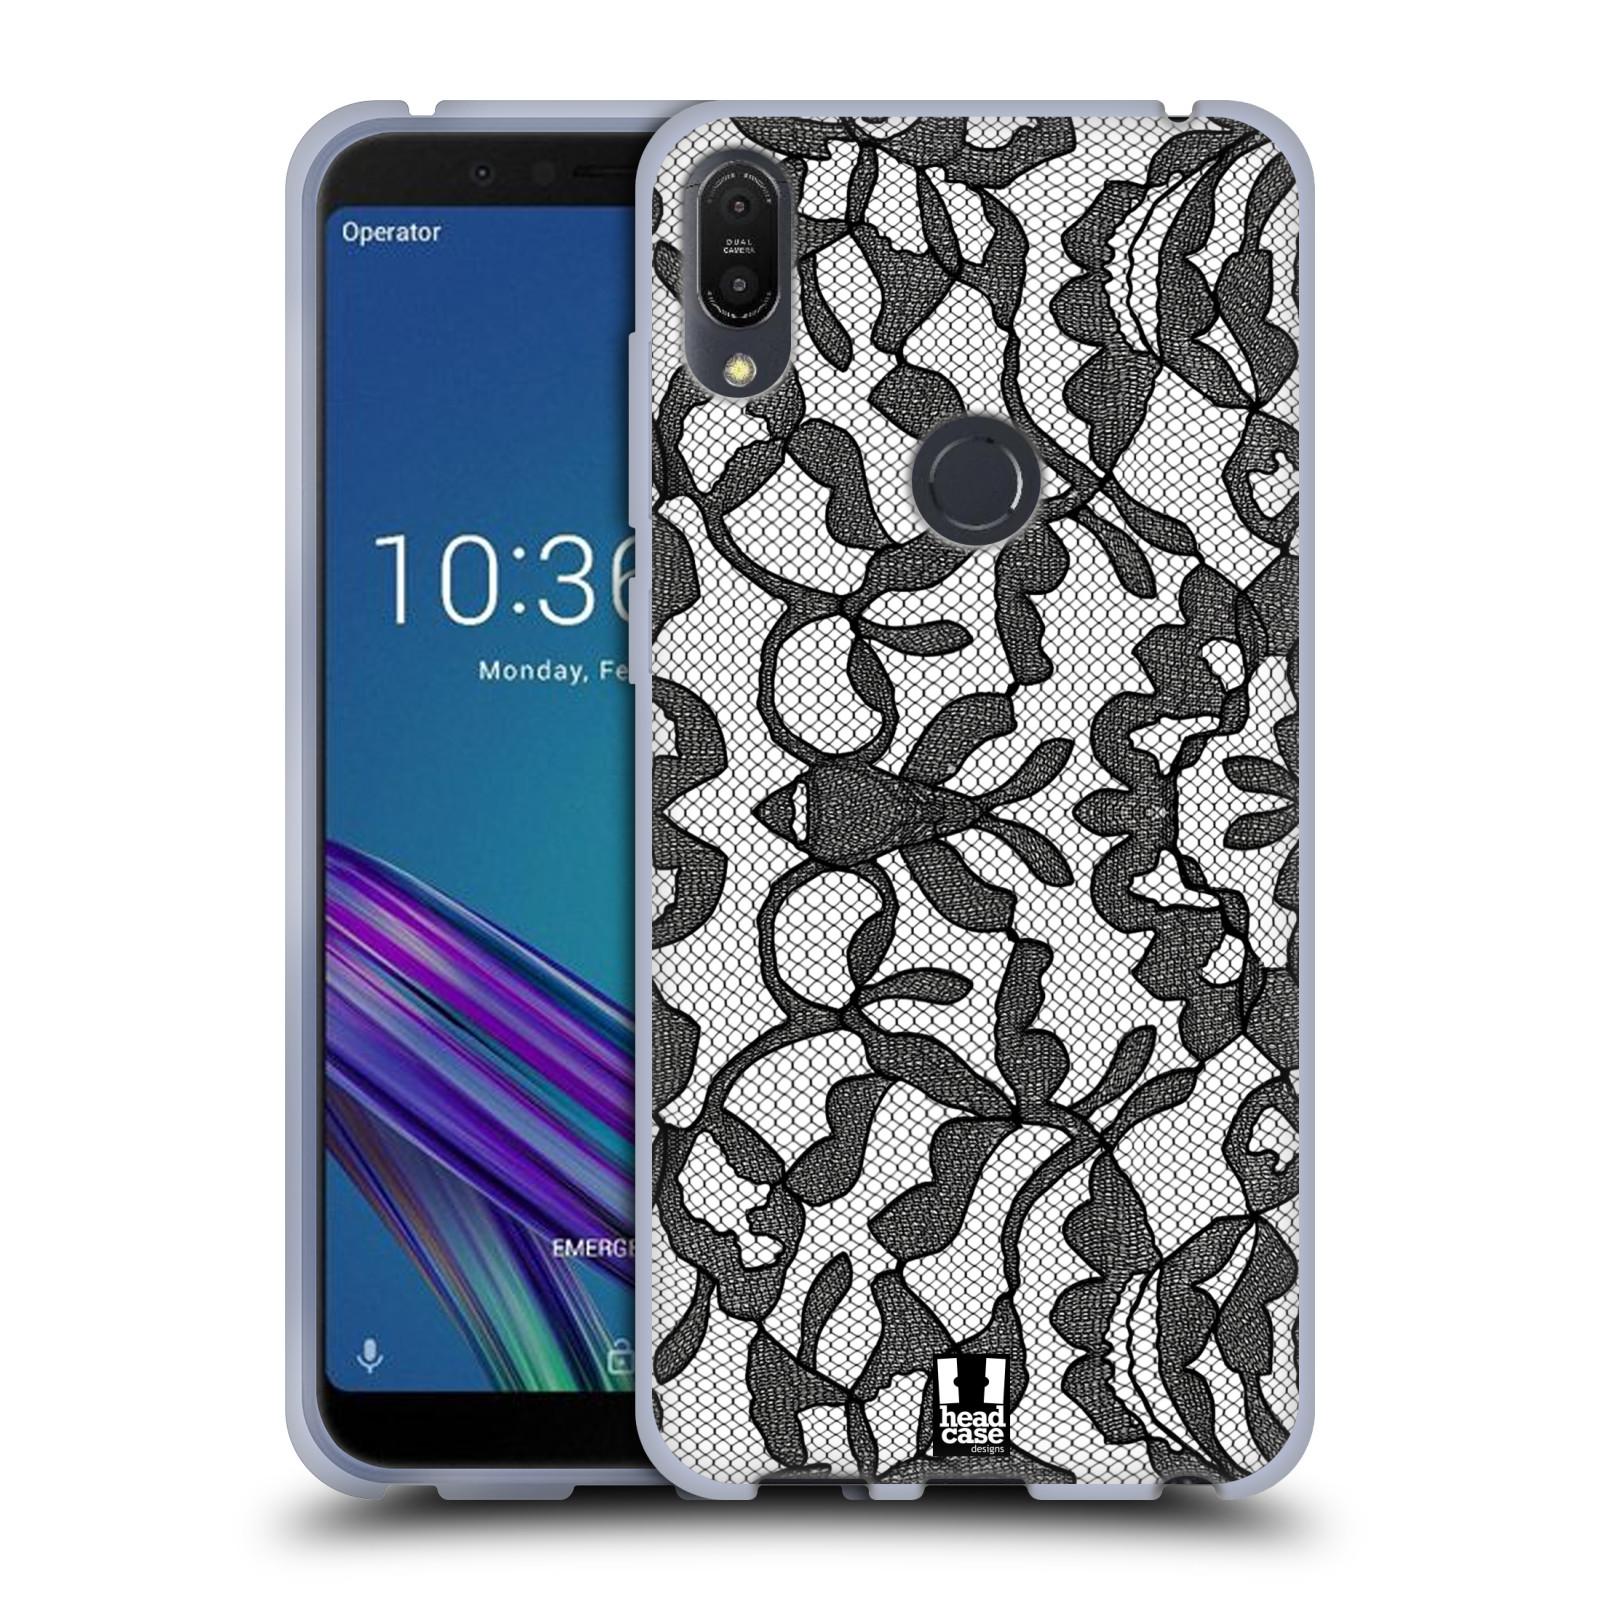 Silikonové pouzdro na mobil Asus ZenFone Max Pro (M1) - Head Case - LEAFY KRAJKA